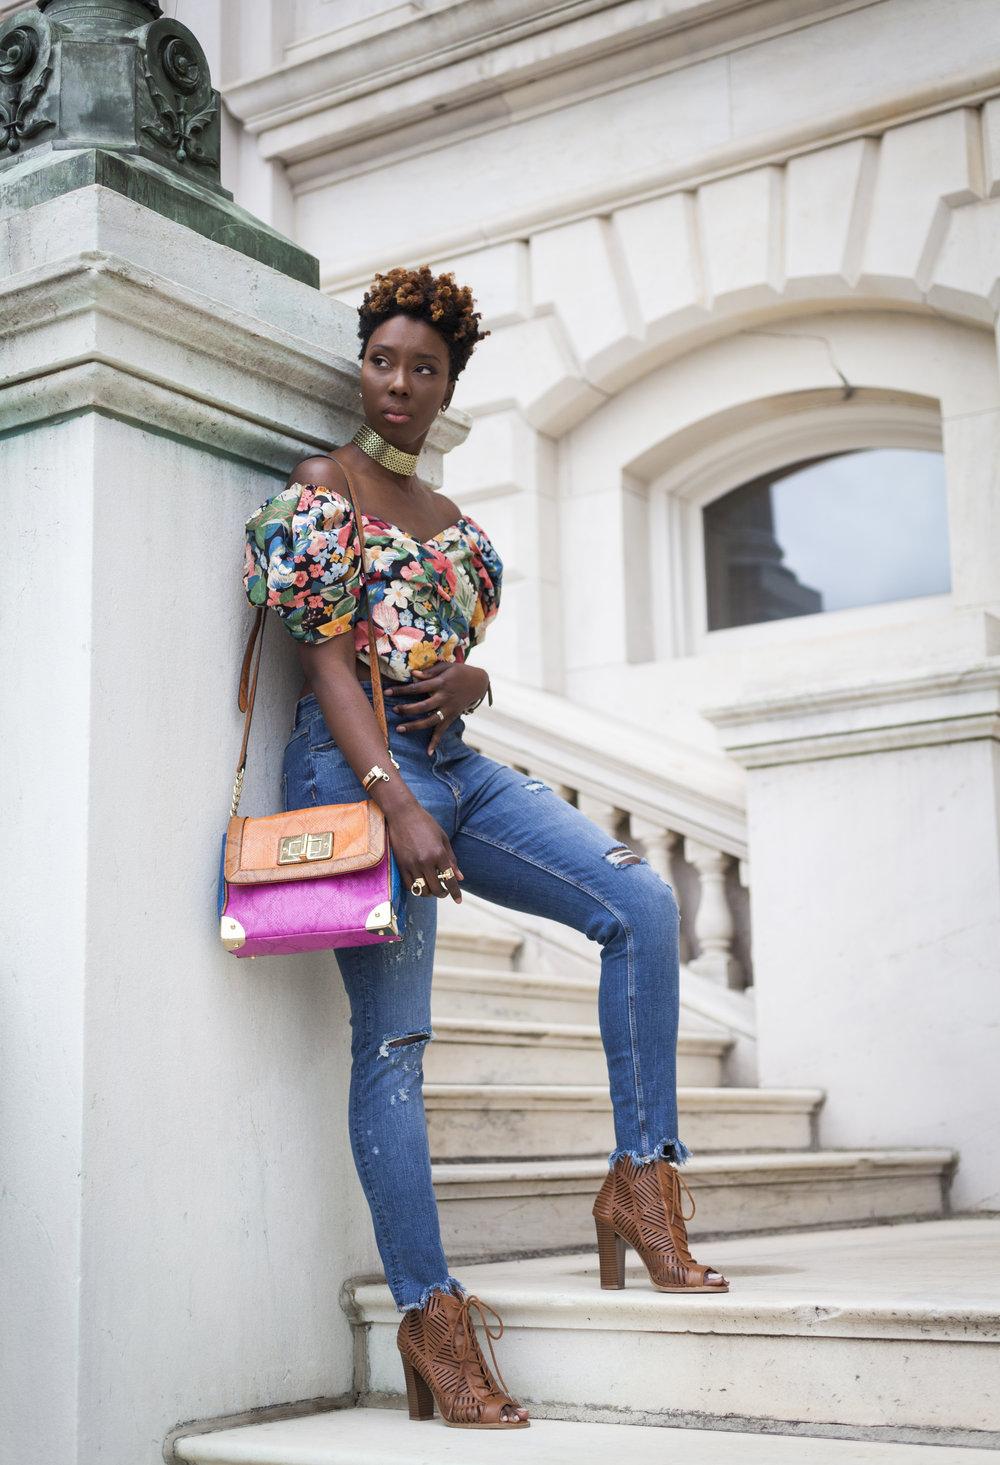 Zara-flora-off-the-shoulder-top-jeans-dsw-shoes2